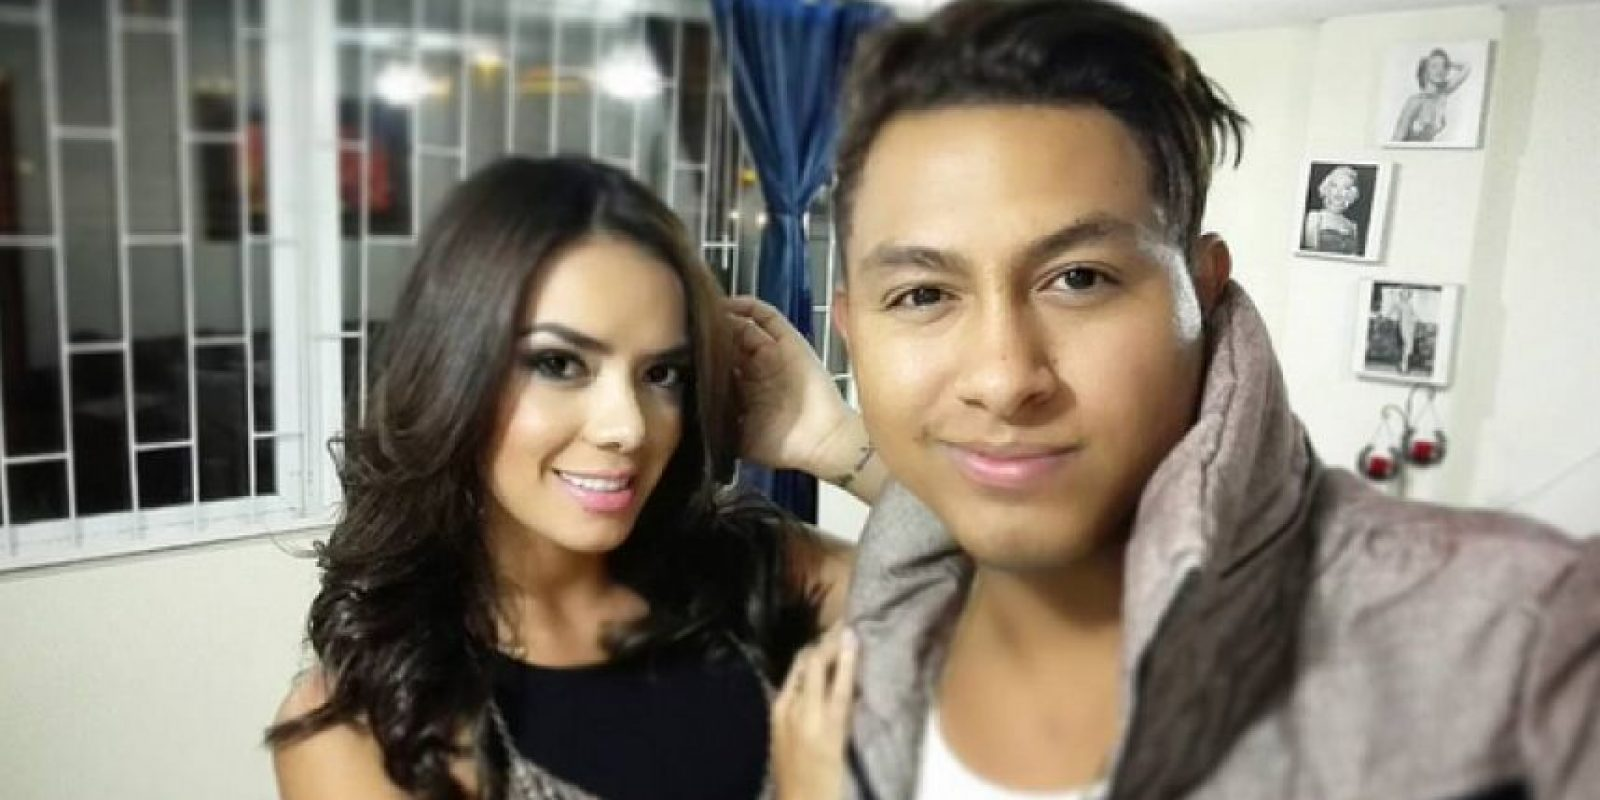 Foto:https://www.instagram.com/elianisgarridozapata/